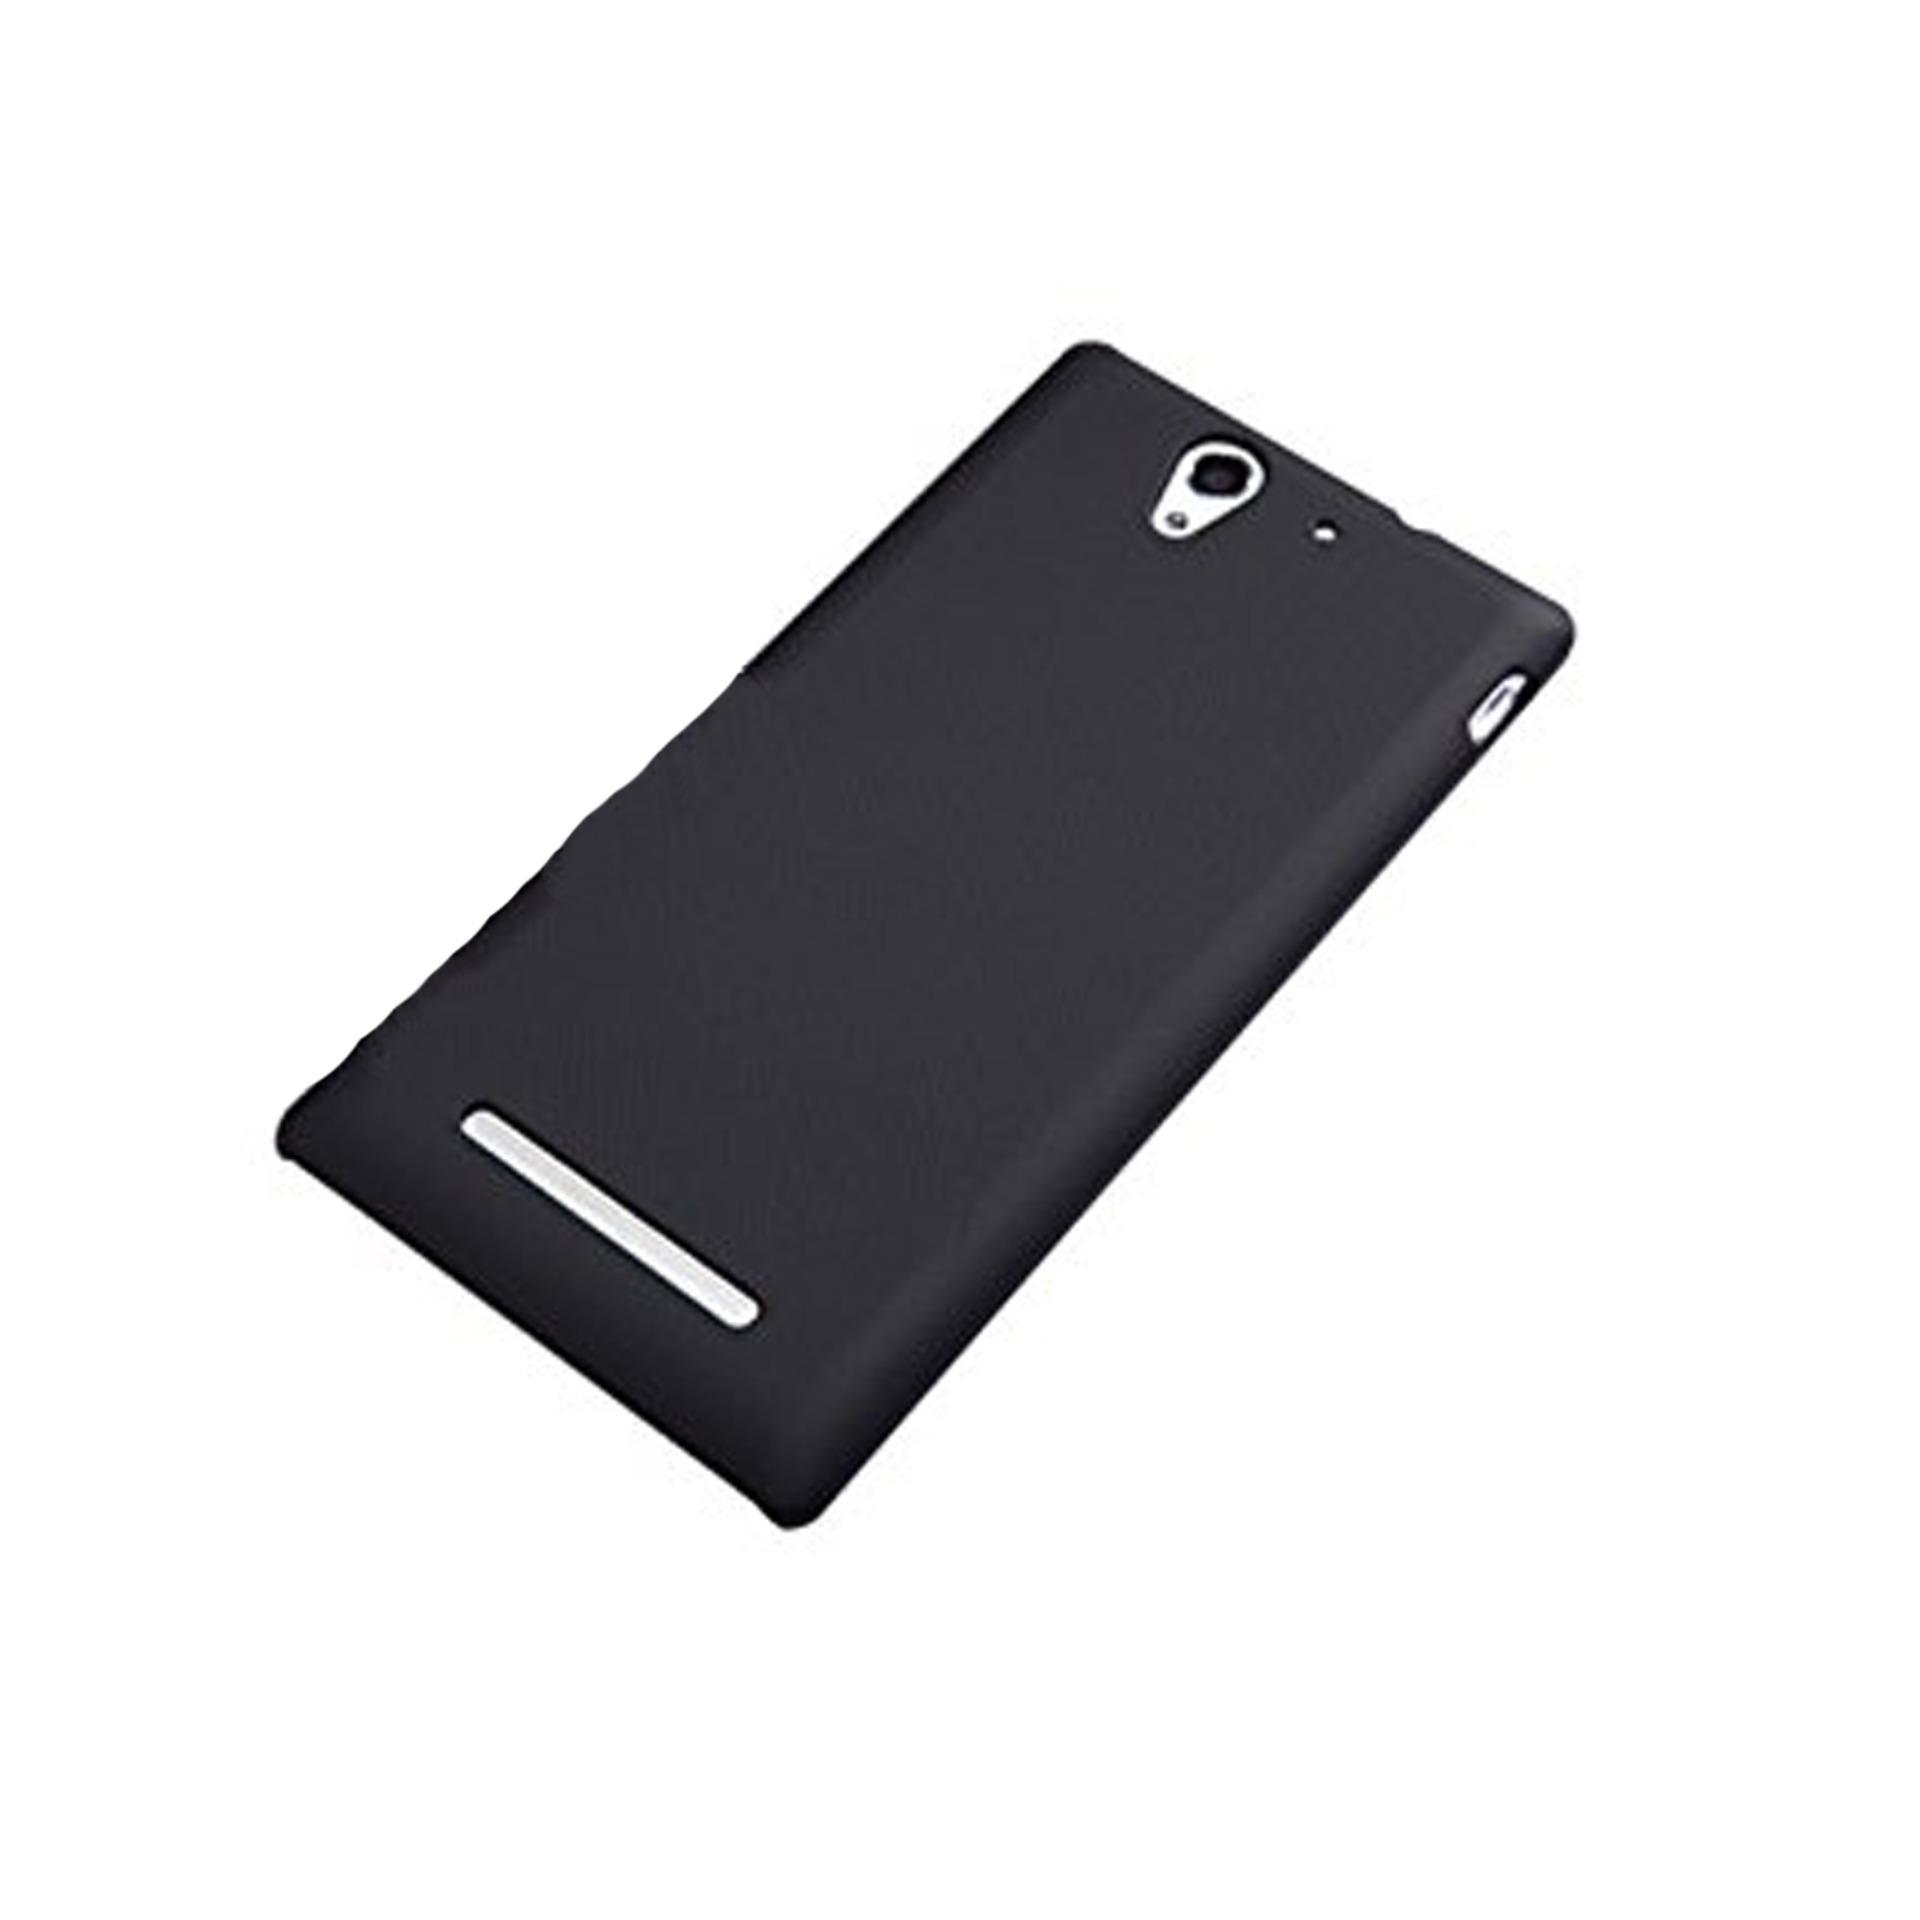 Case Slim Black Matte Sony Experia C3 Baby Skin Softcase Ultra Thin Jelly Silikon Babyskin